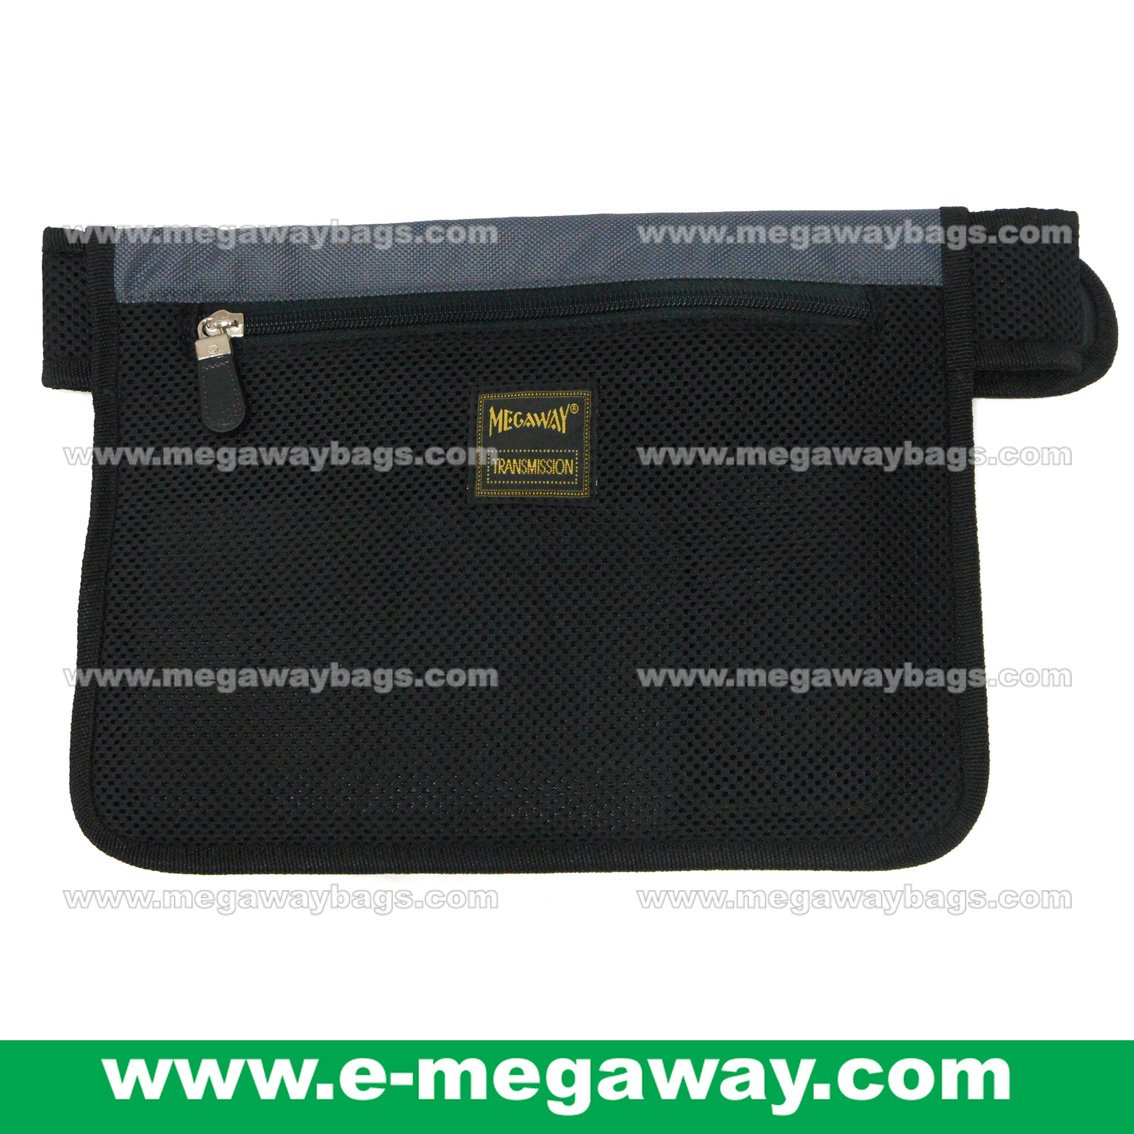 Designer Waist Bag (Detachable Belt) Purse Pouch Wallet Handbag MegawayBags #CC-0935